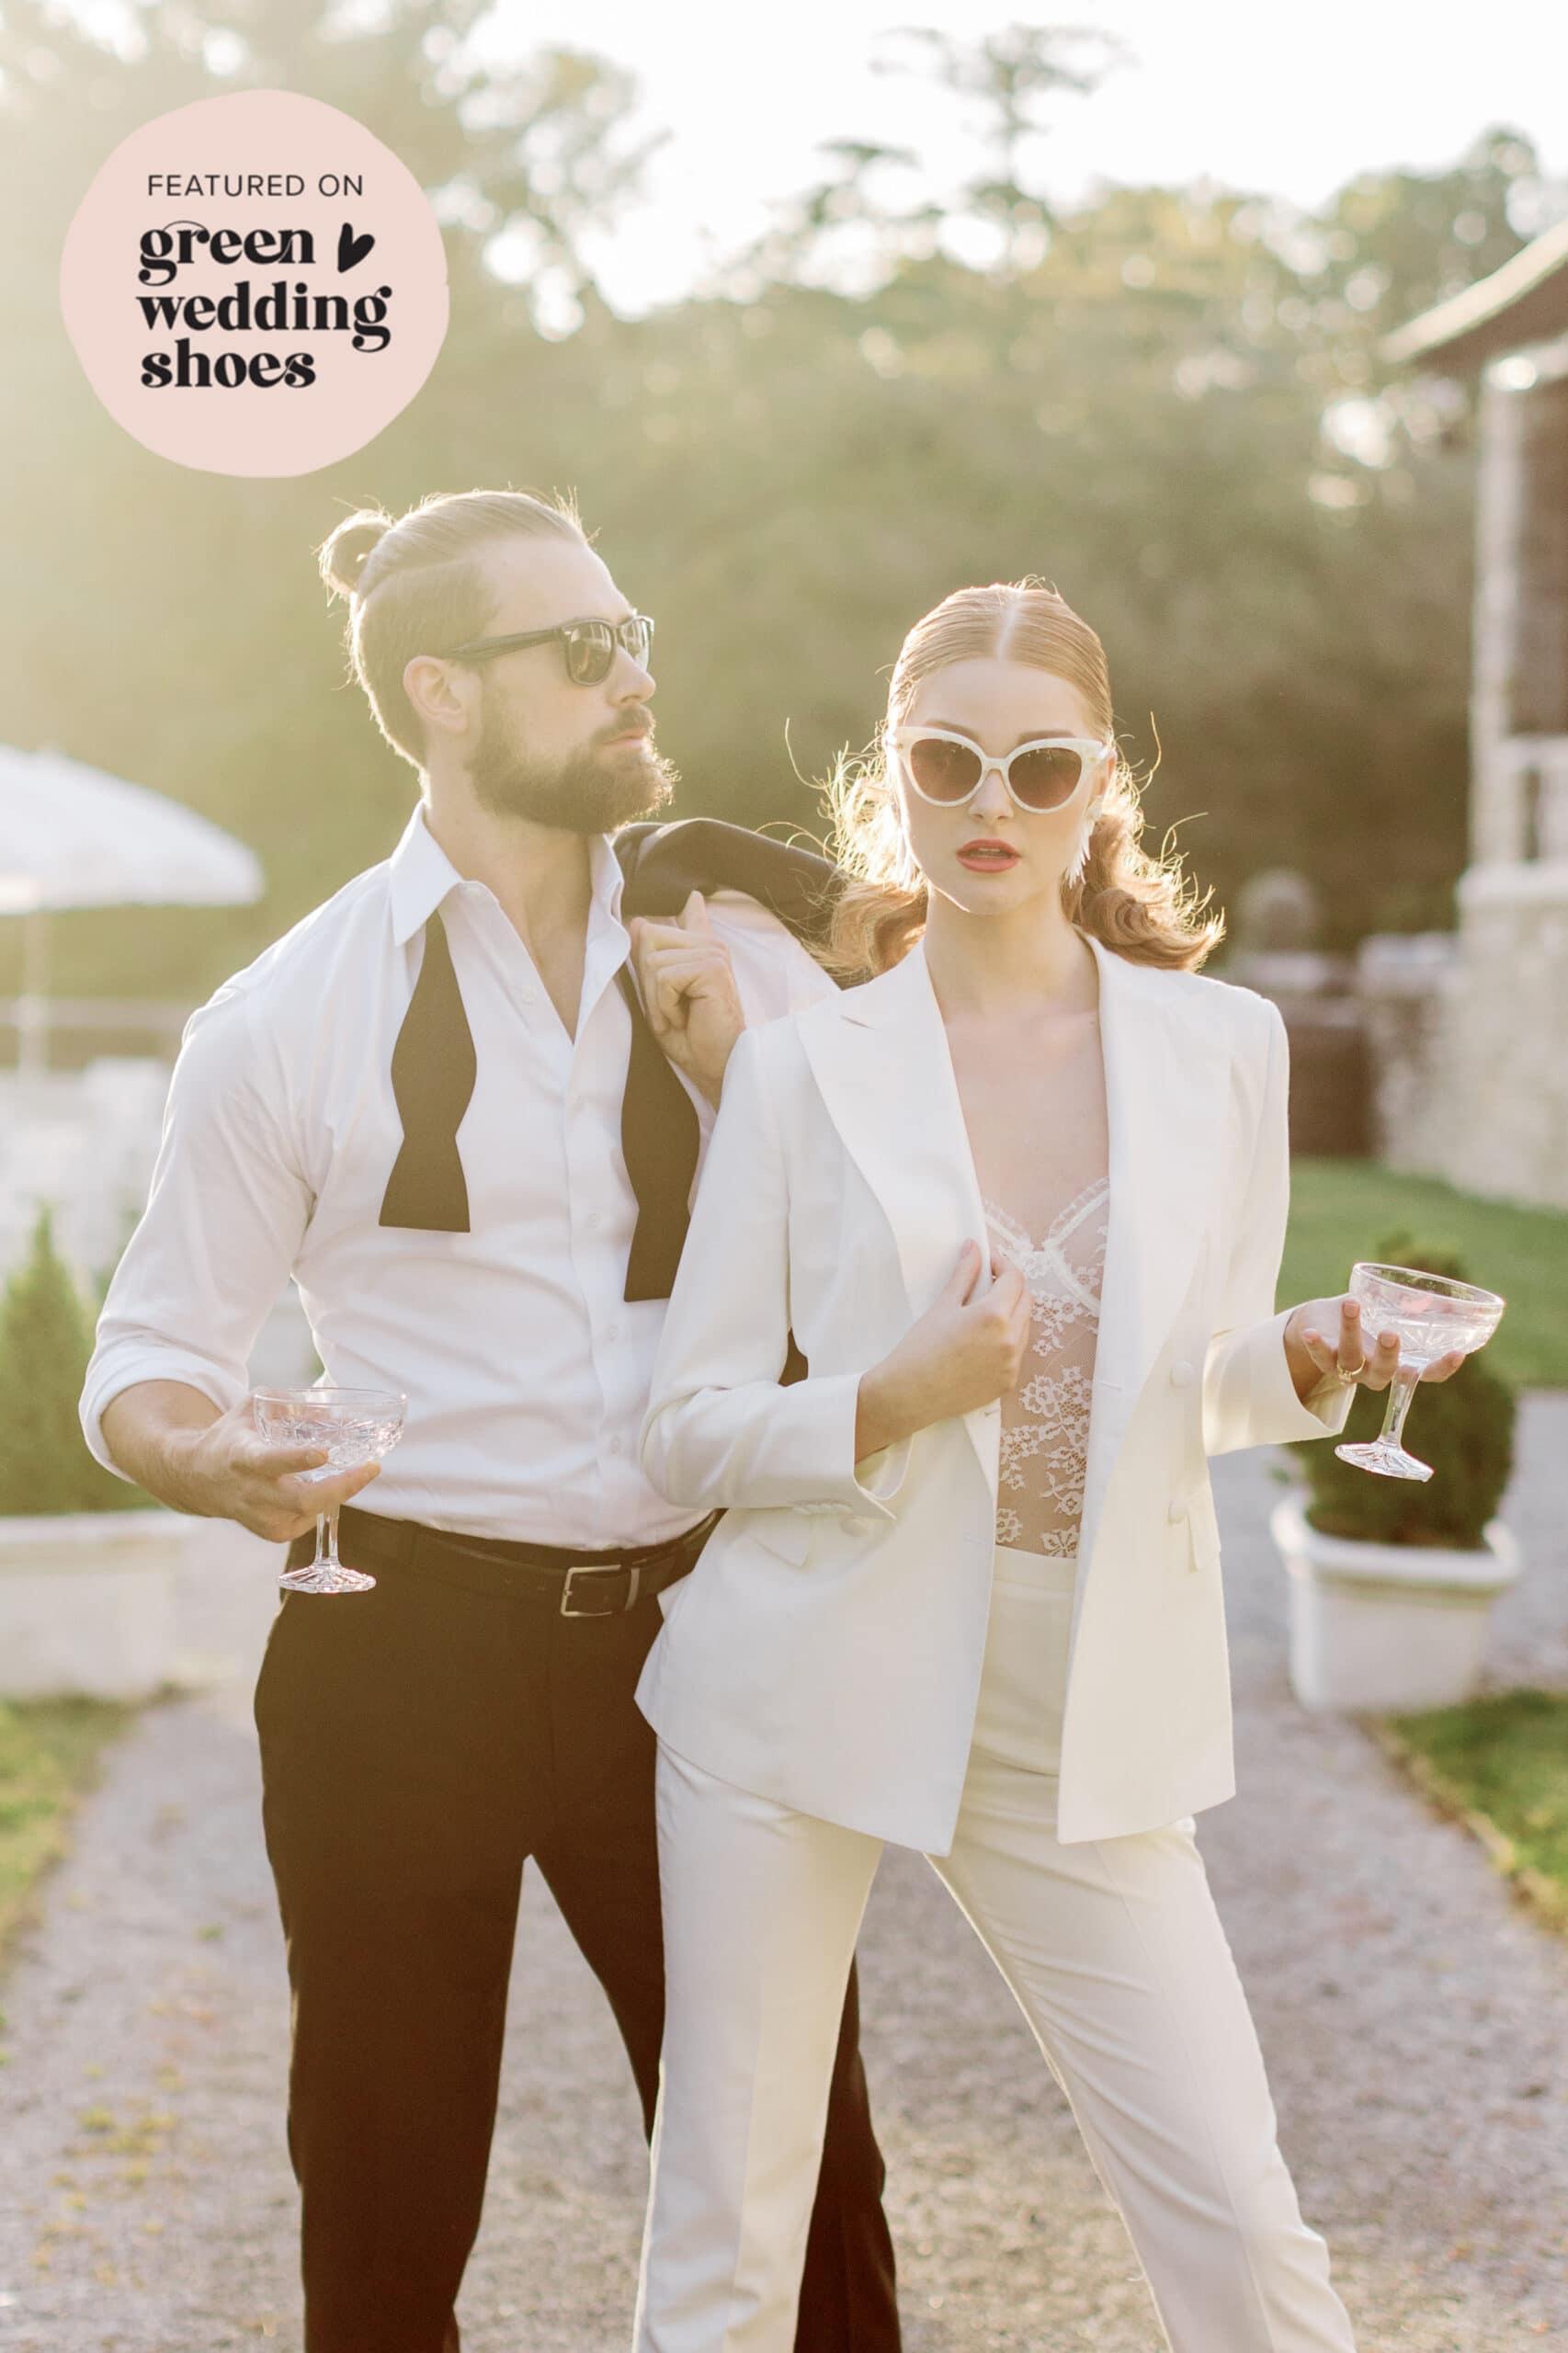 Retro chic wedding style